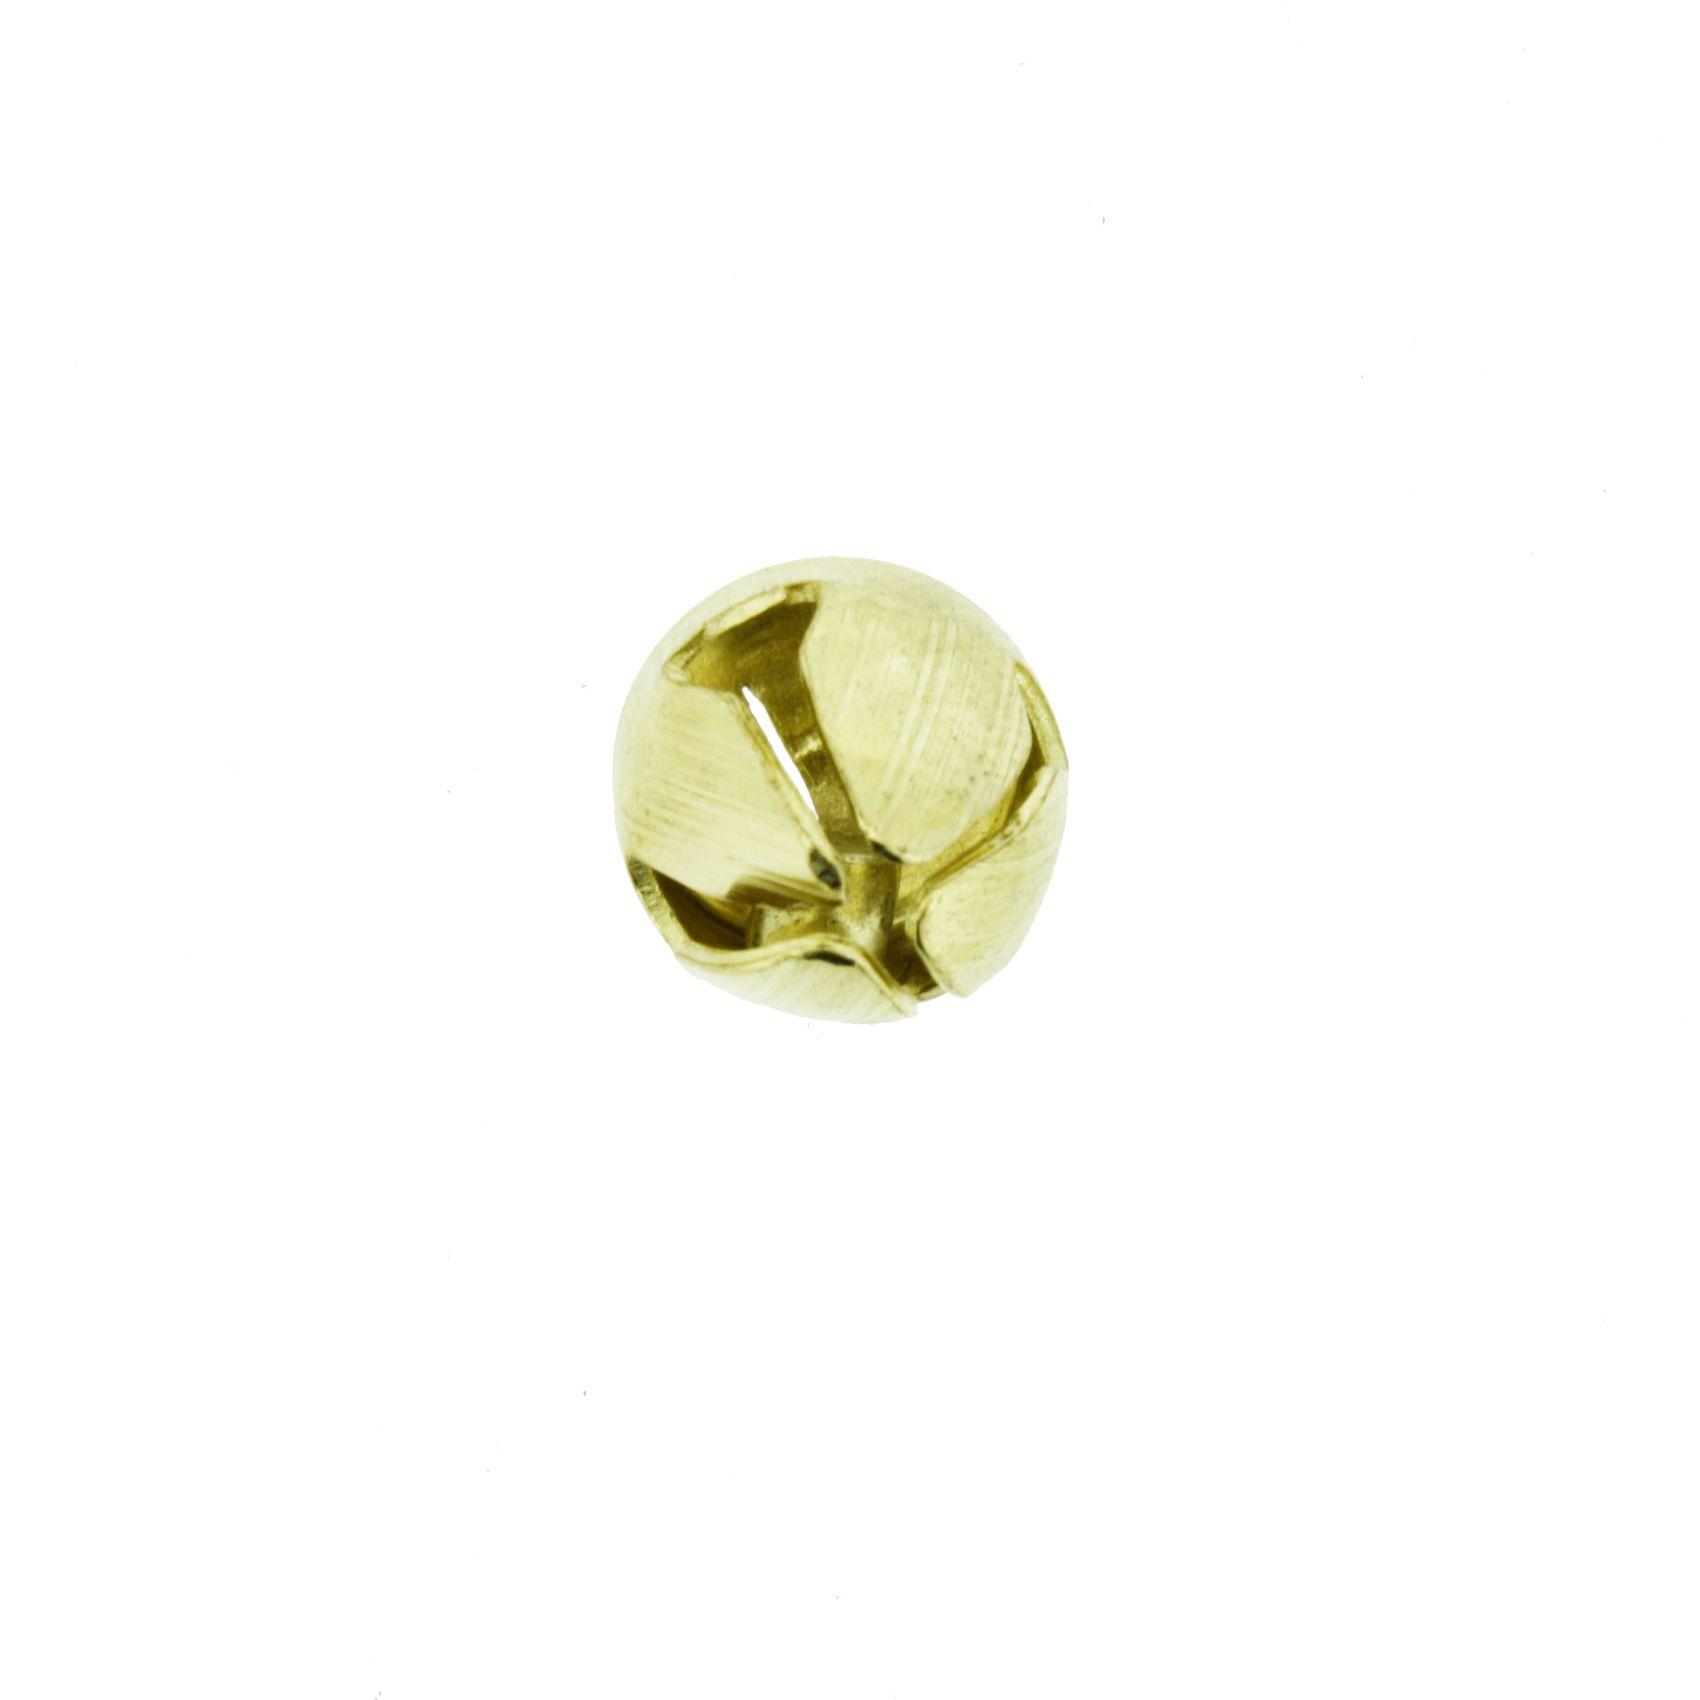 Guizo - Xaôro nº1 - Dourado - 01 peça  - Universo Religioso® - Artigos de Umbanda e Candomblé